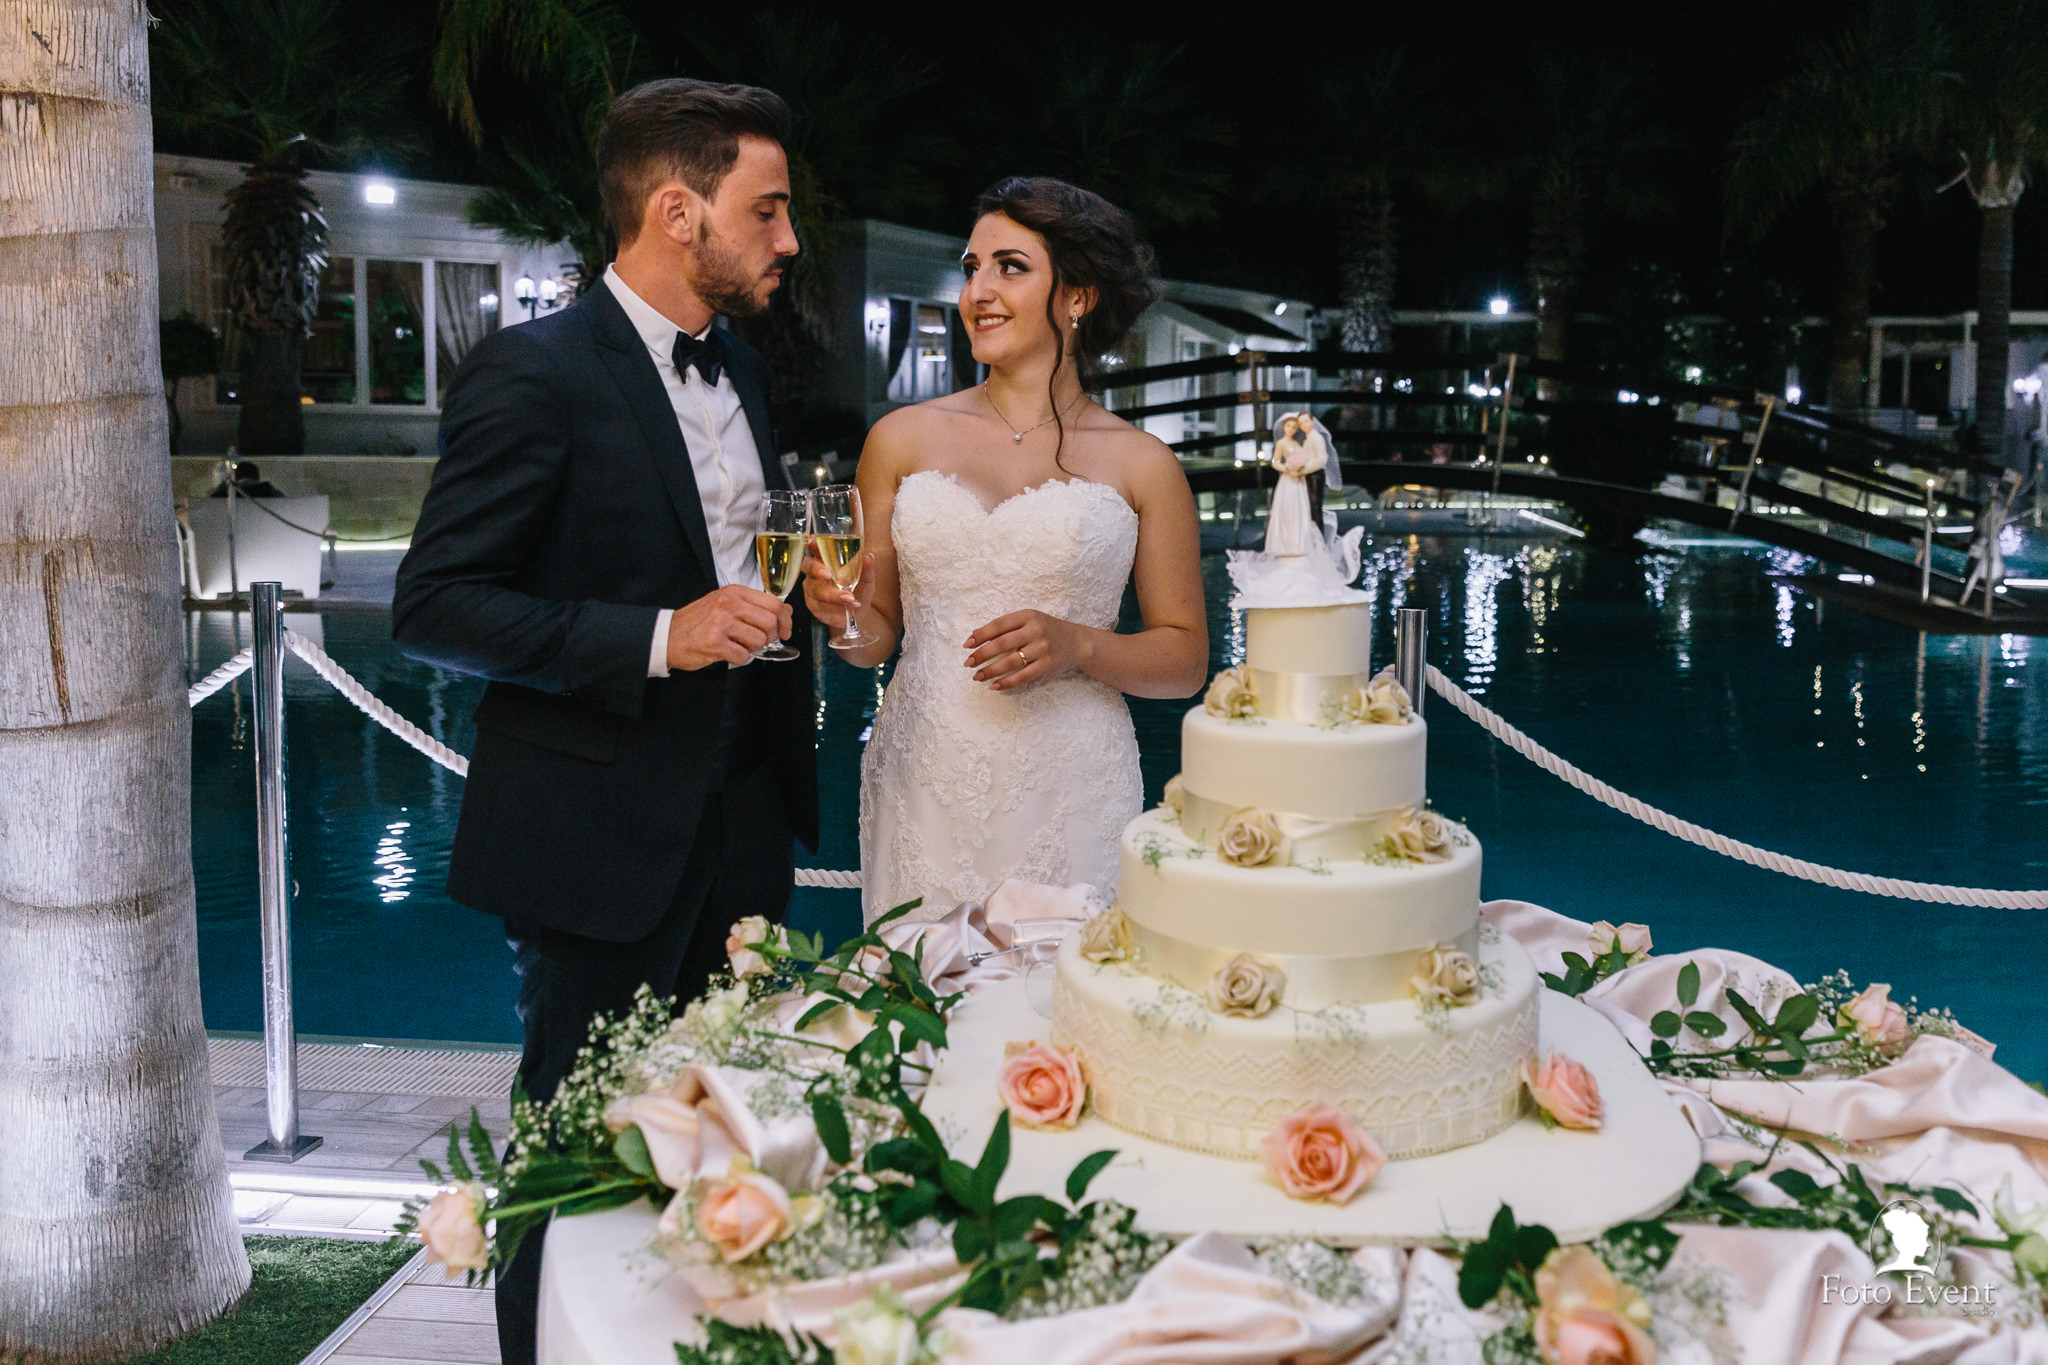 057-2019-08-31-Matrimonio-Serena-e-Saverio-Tarantino-5DE-1814